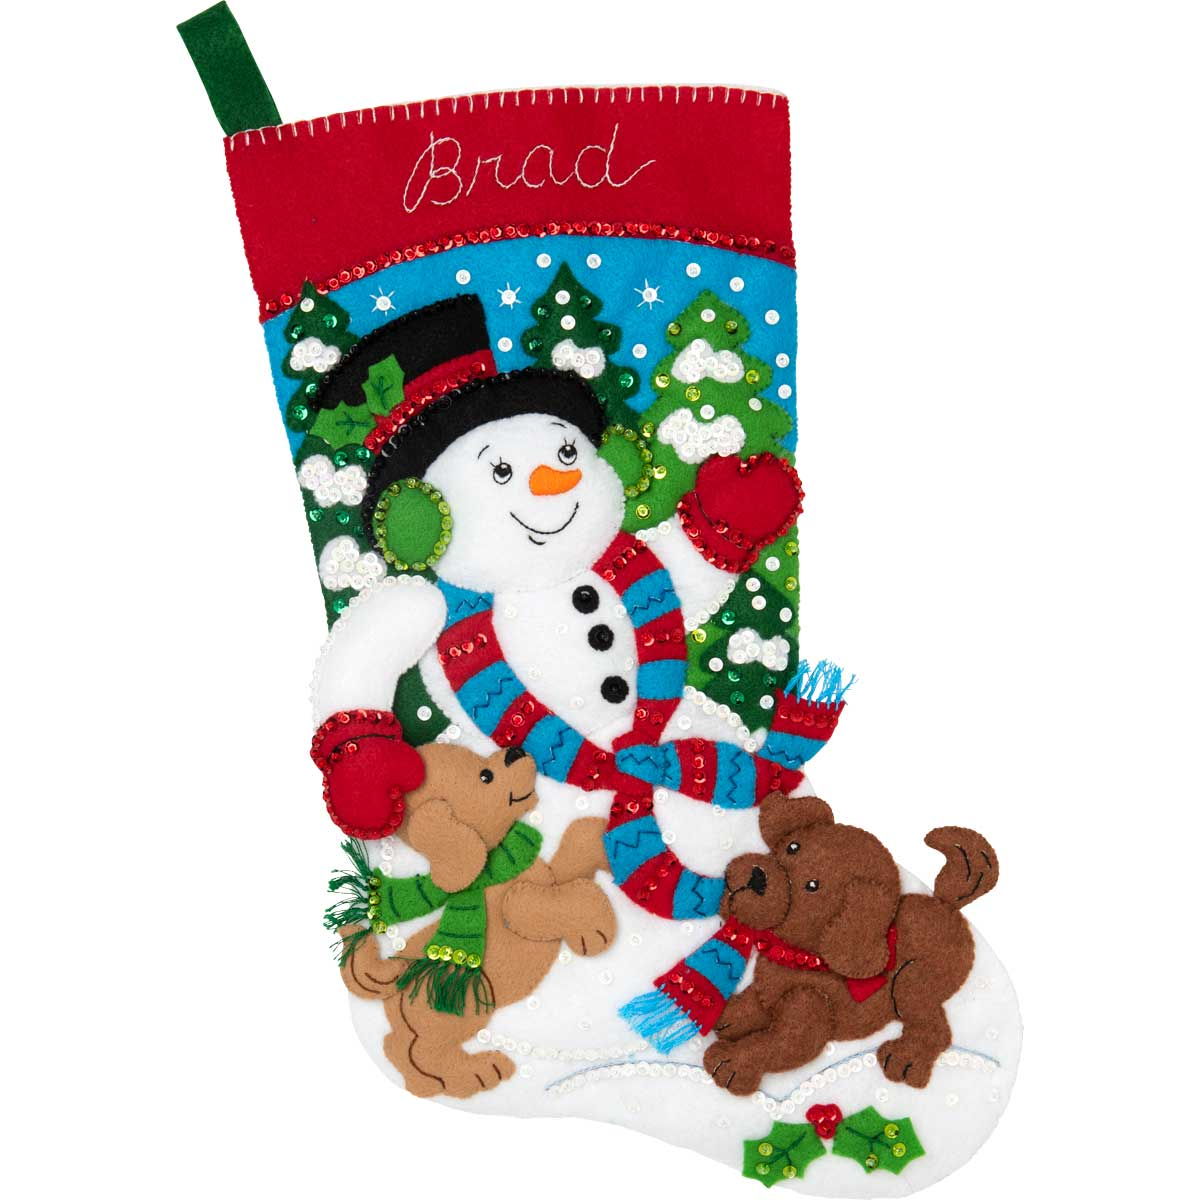 Bucilla ® Seasonal - Felt - Stocking Kits - Snowman and Puppies - 86900E